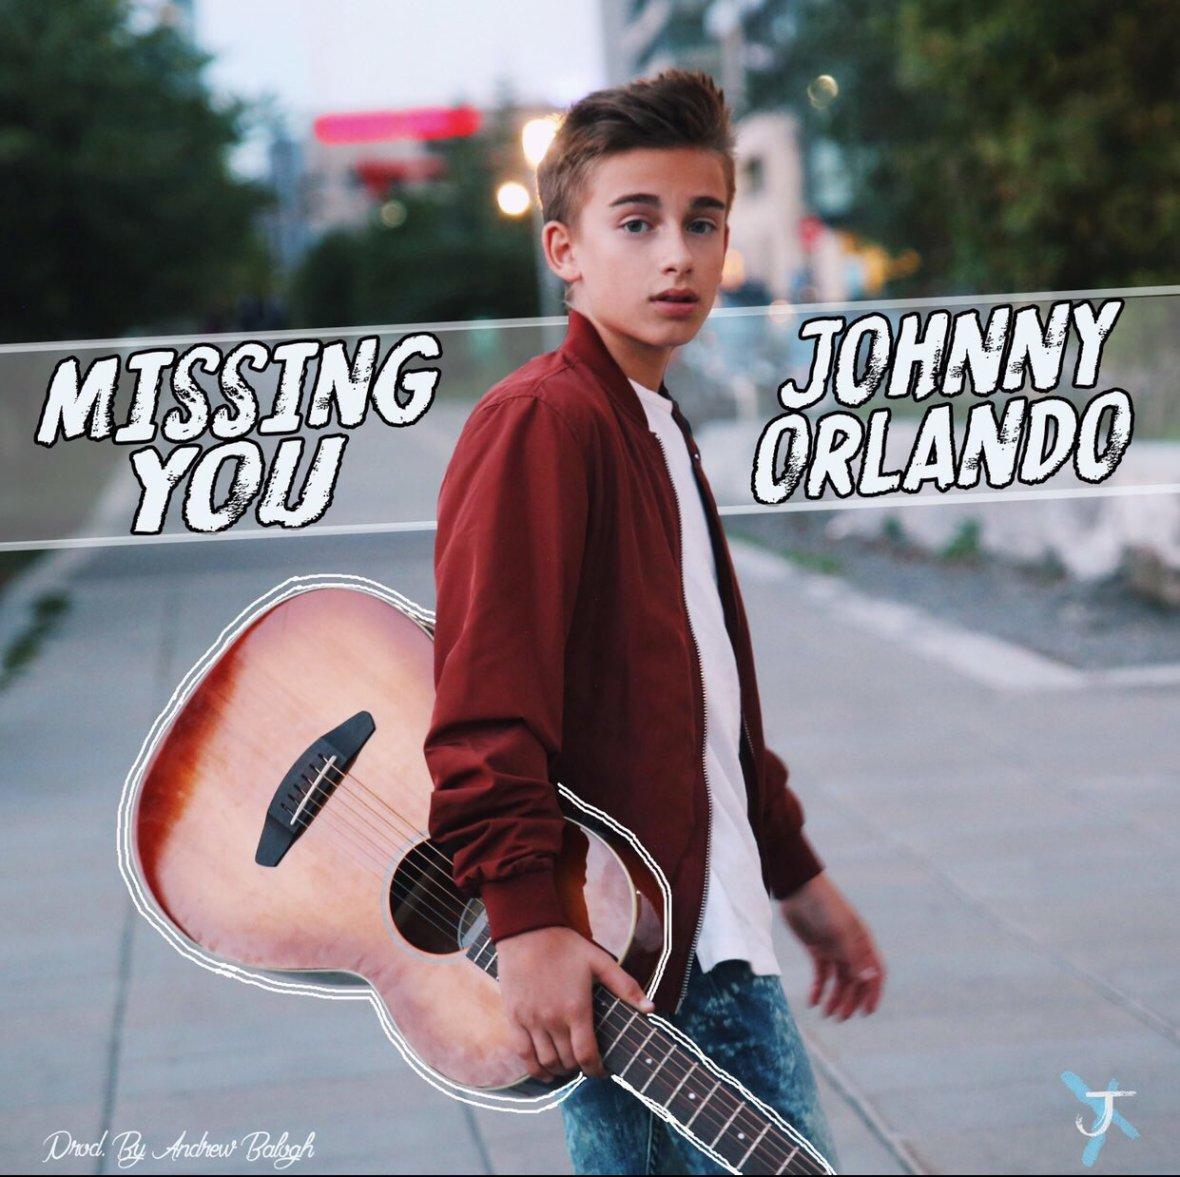 johnny orlando missing you